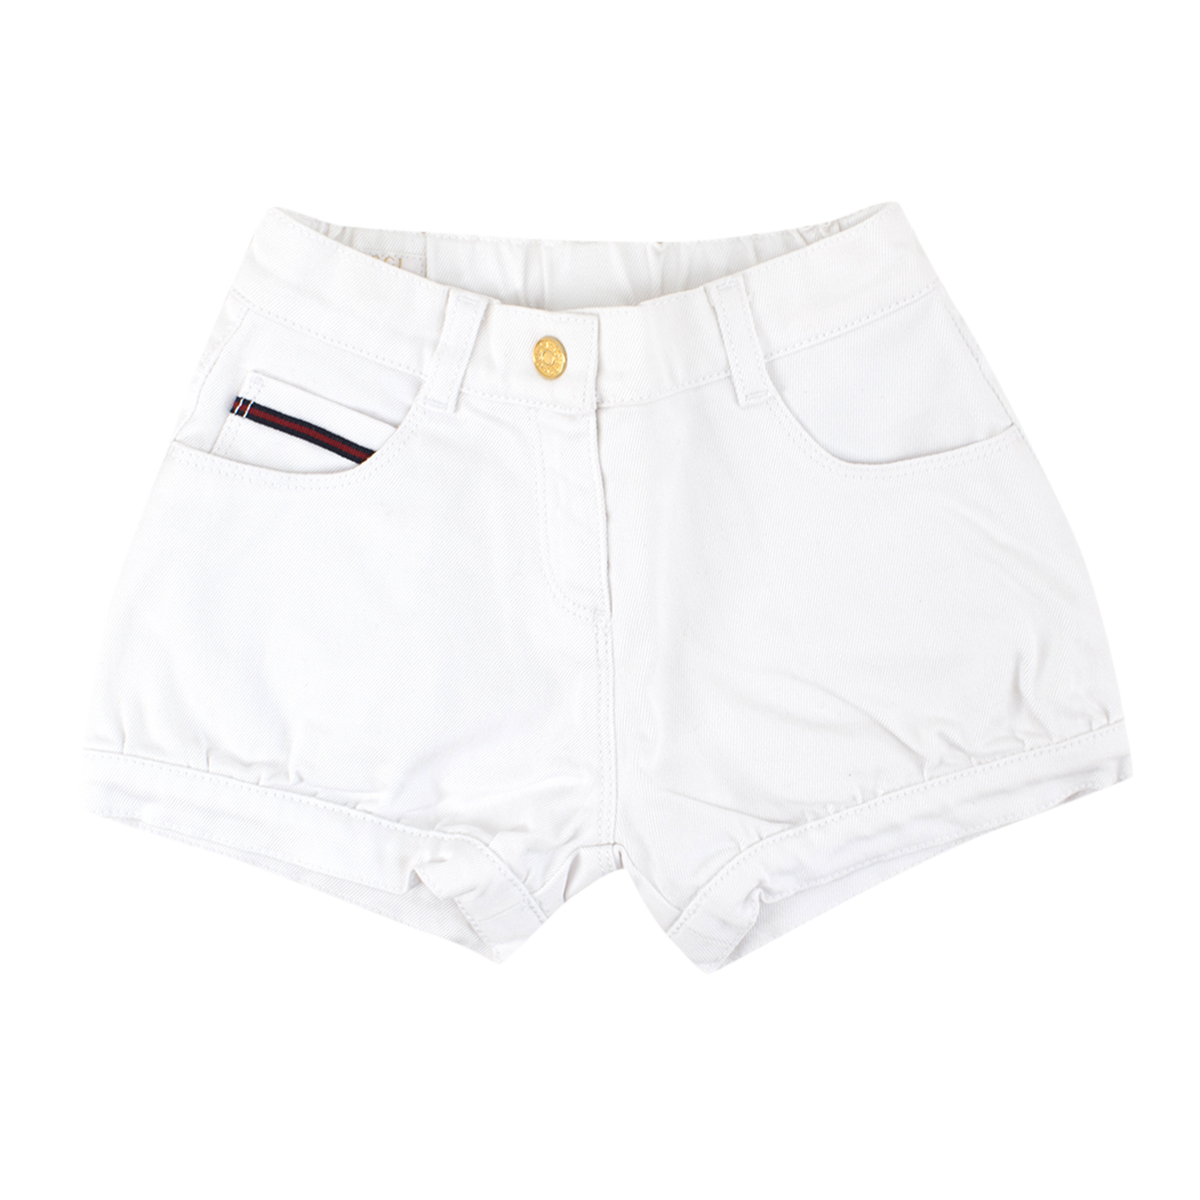 Gucci Baby 2Y White Denim Shorts